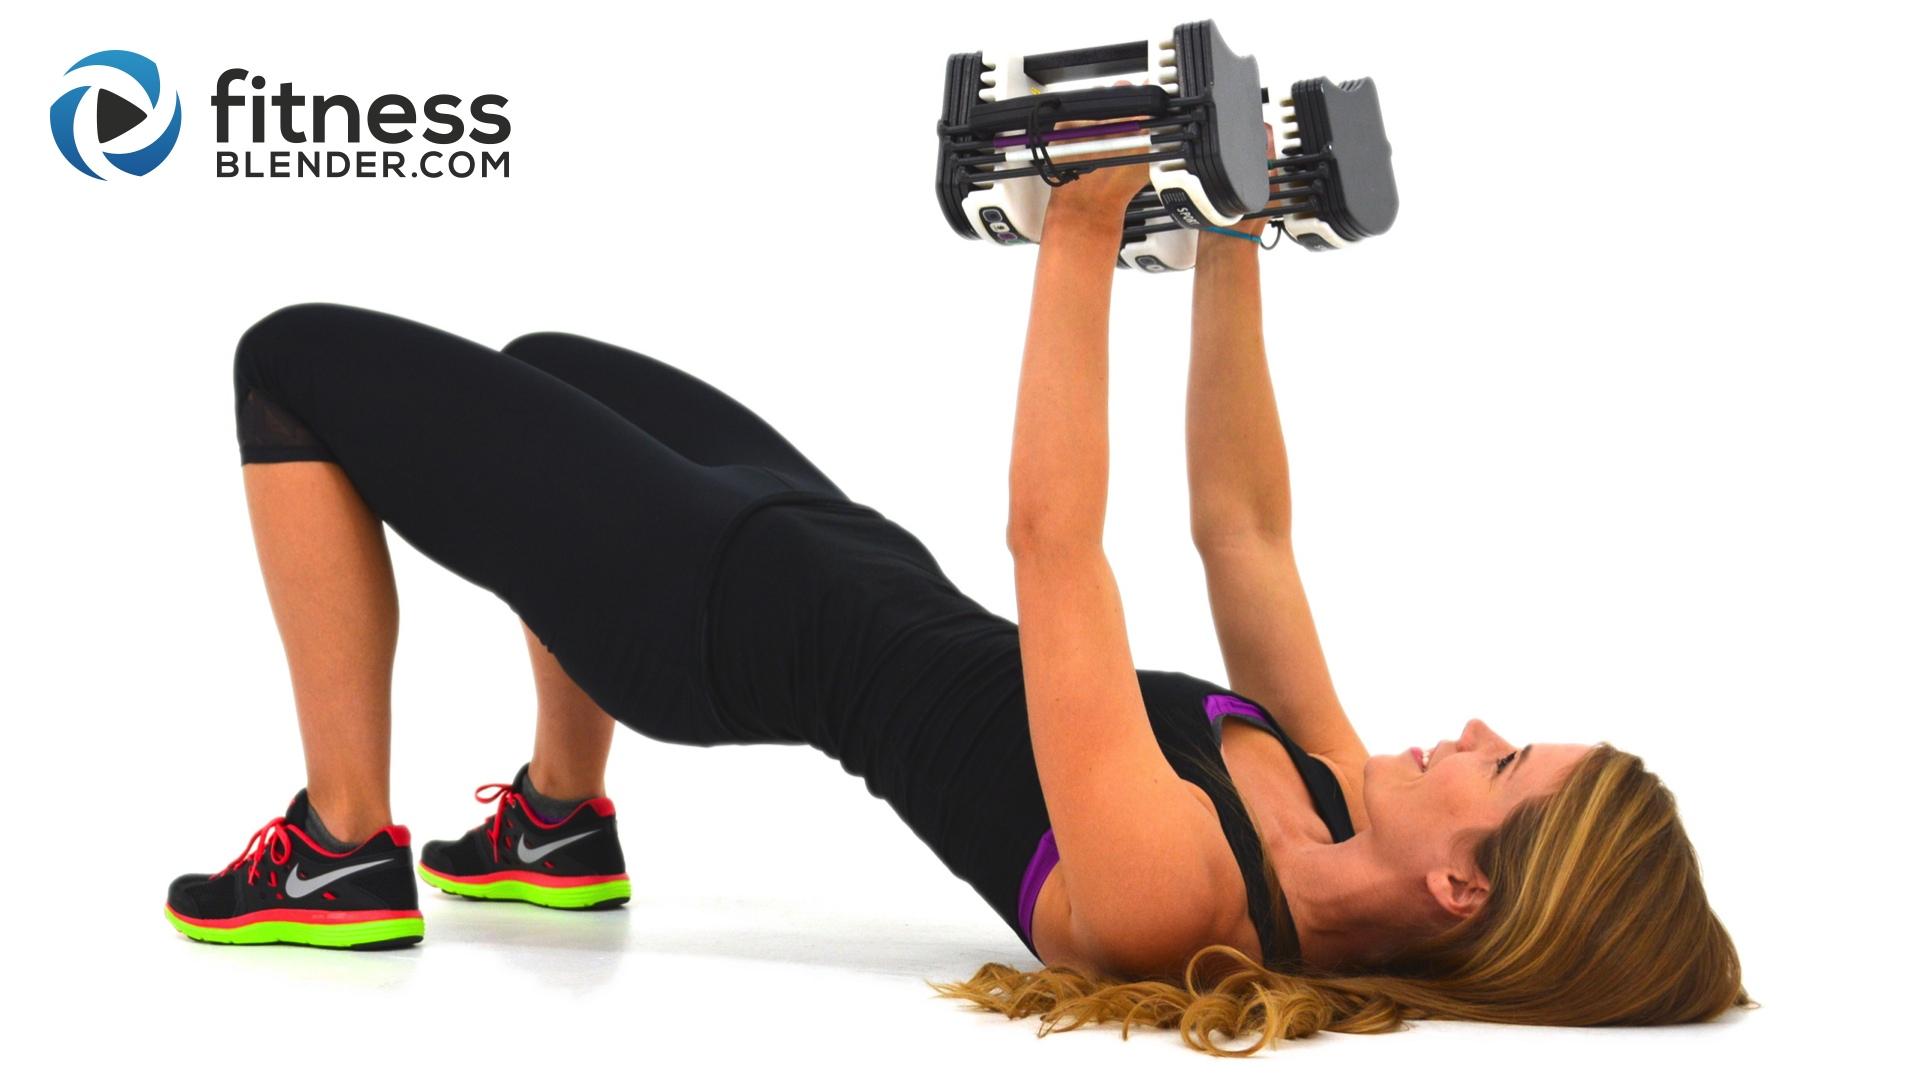 Upper Body Sut Workout With Fat Burning Cardio Intervals Arm Chest Back Shoulder Fitness Blender